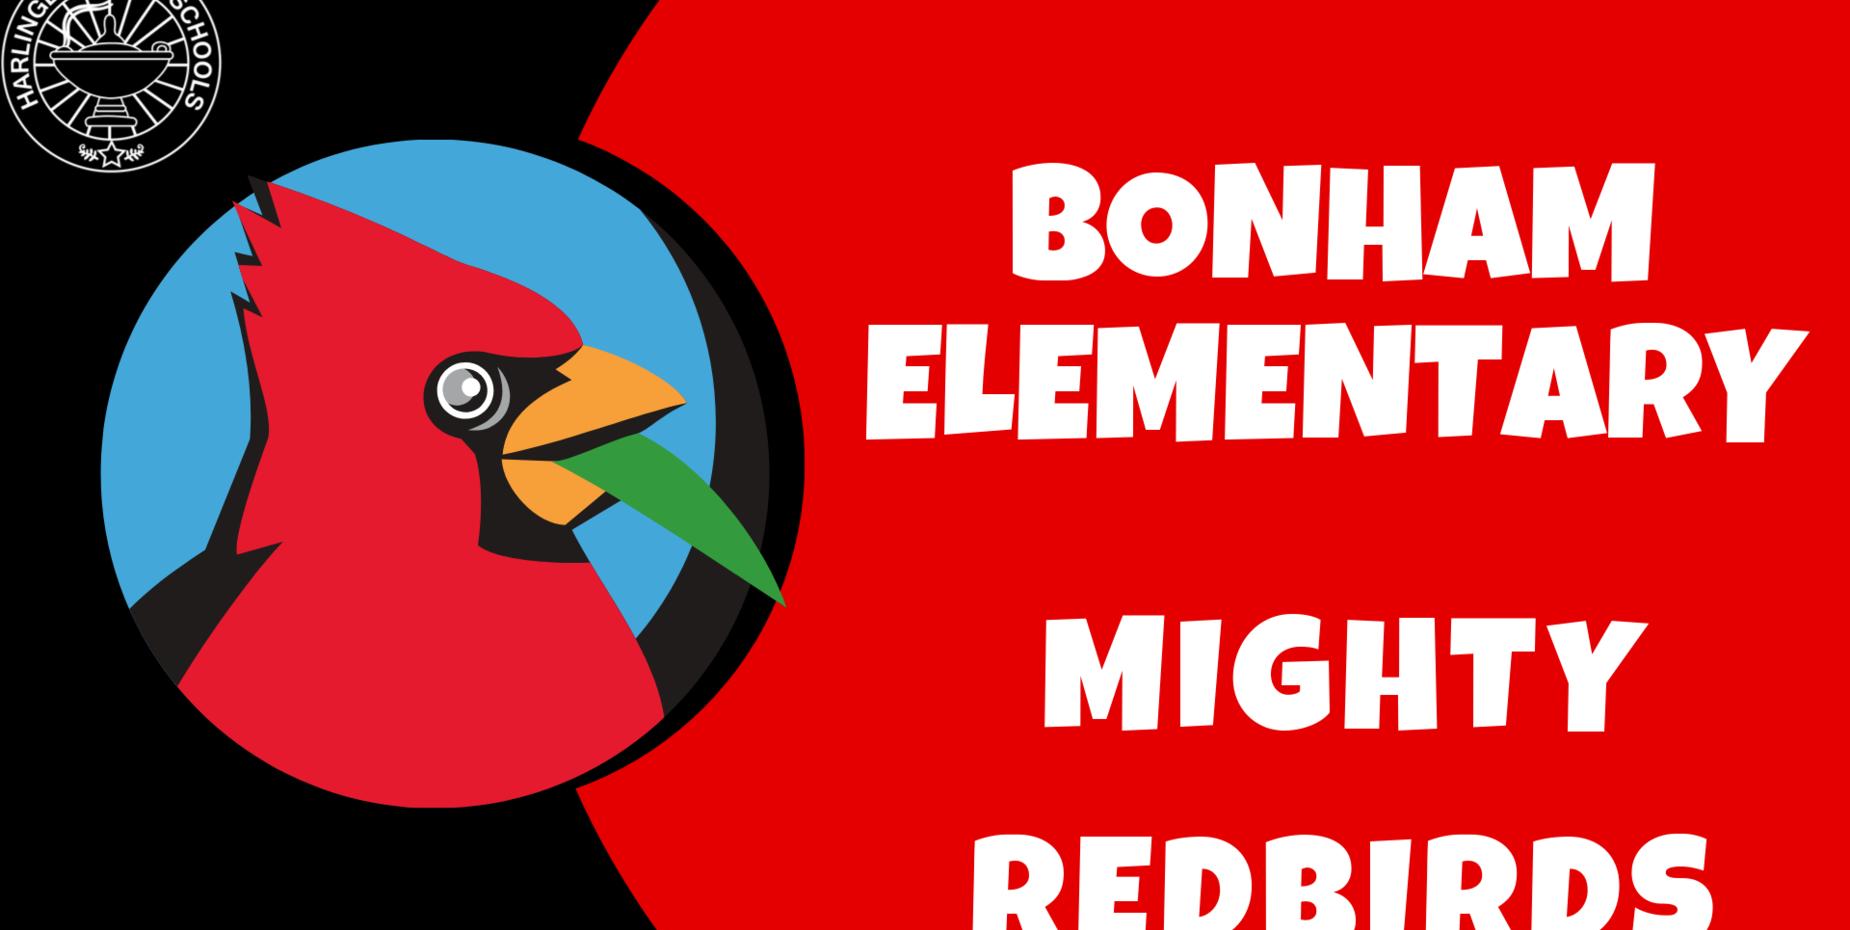 Bonham Elementary Redbirds